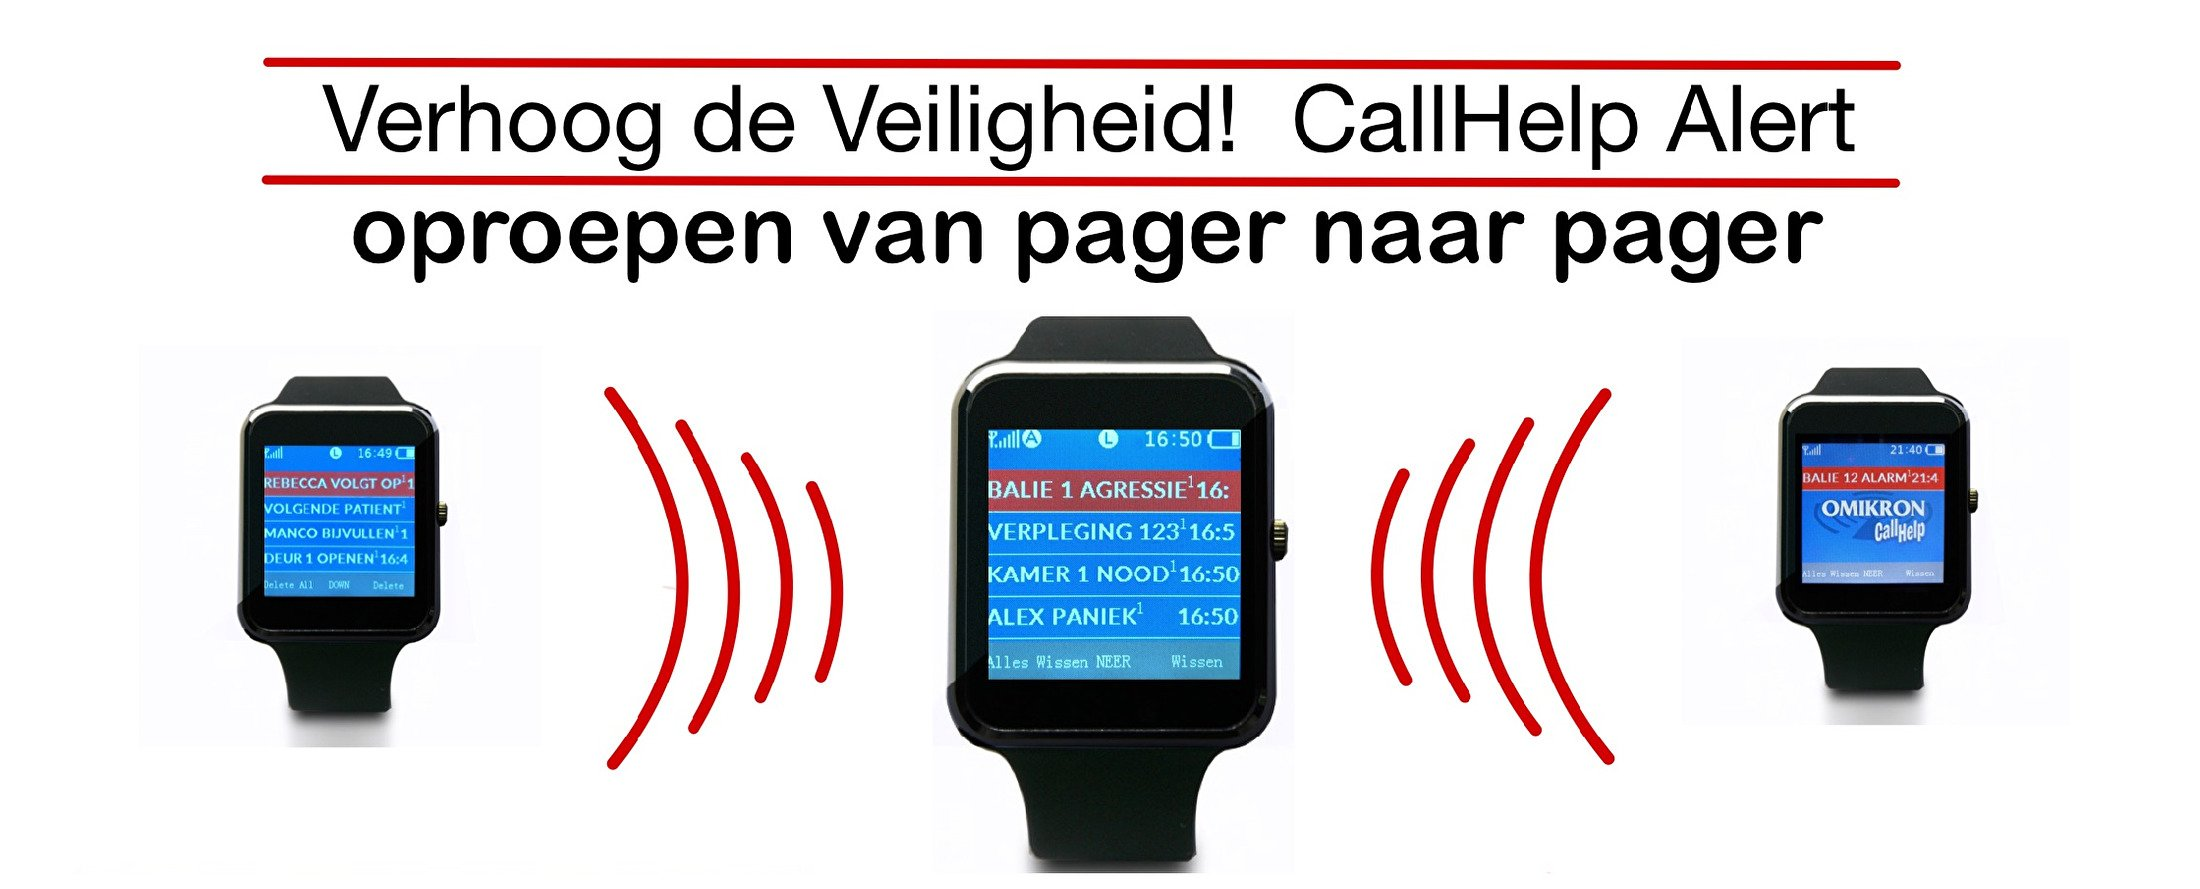 Homepage CallHelp Alert